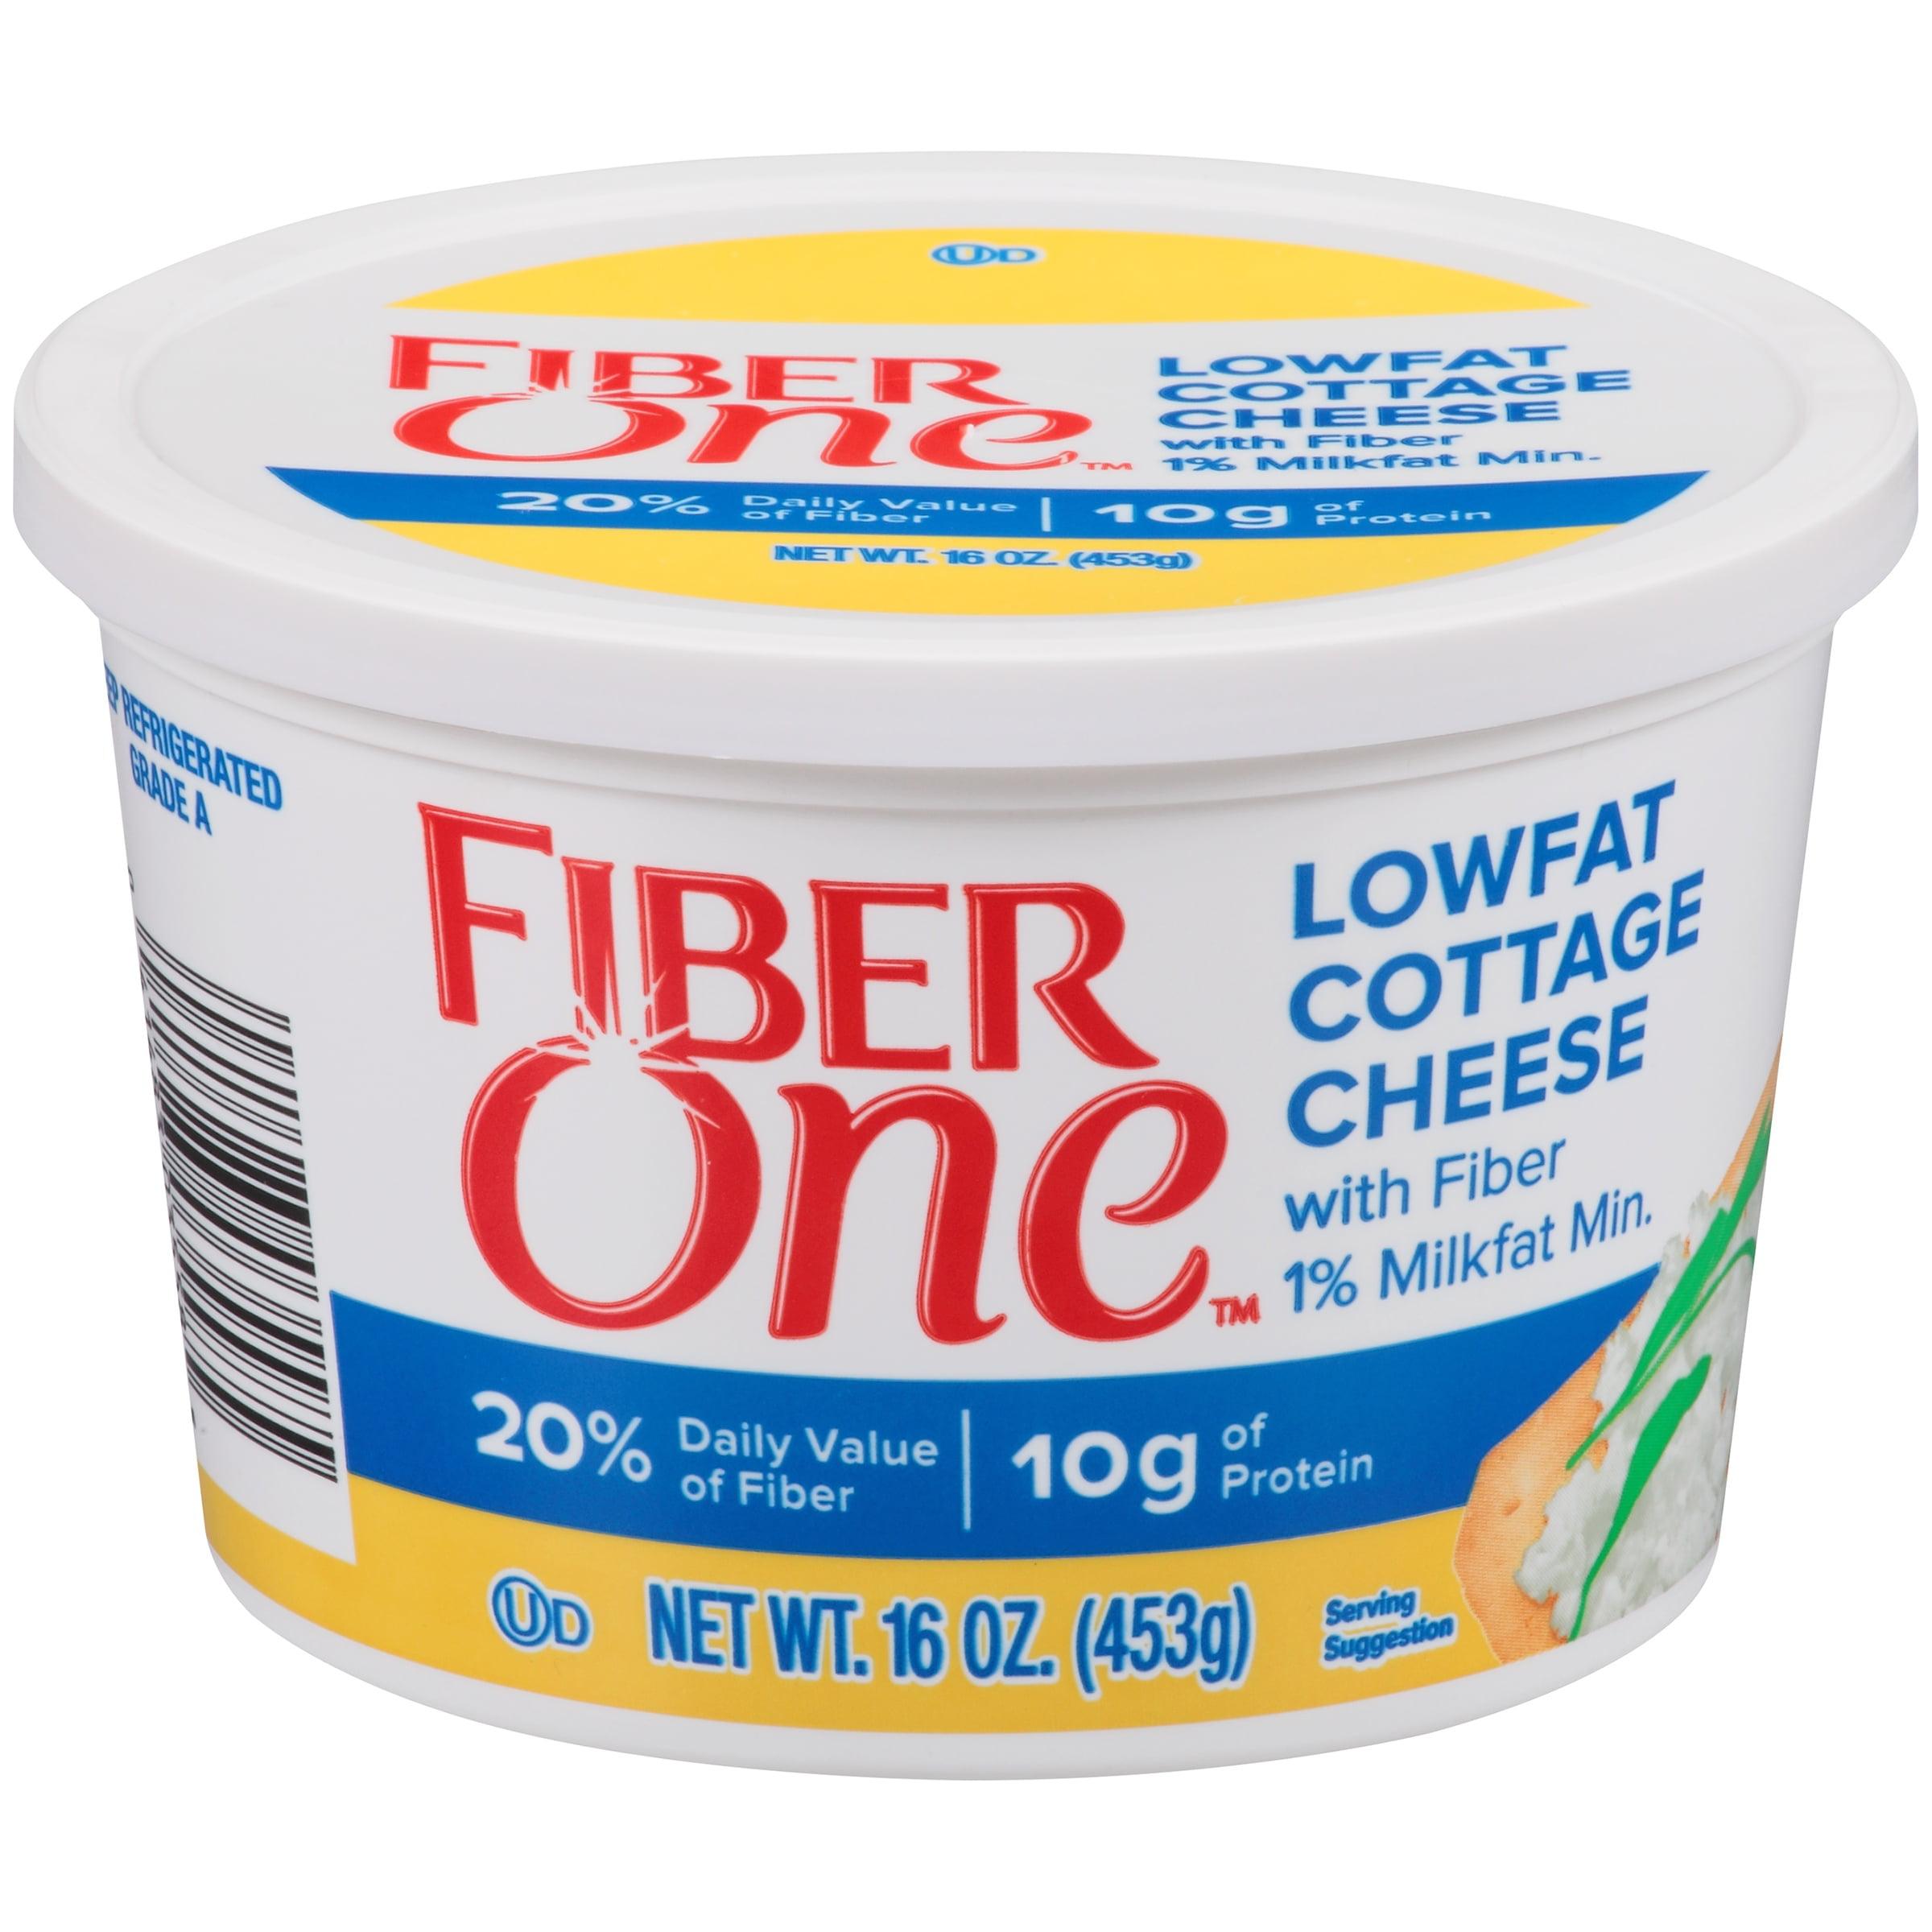 Fiber One™ Lowfat Cottage Cheese with Fiber 16 oz. Tub